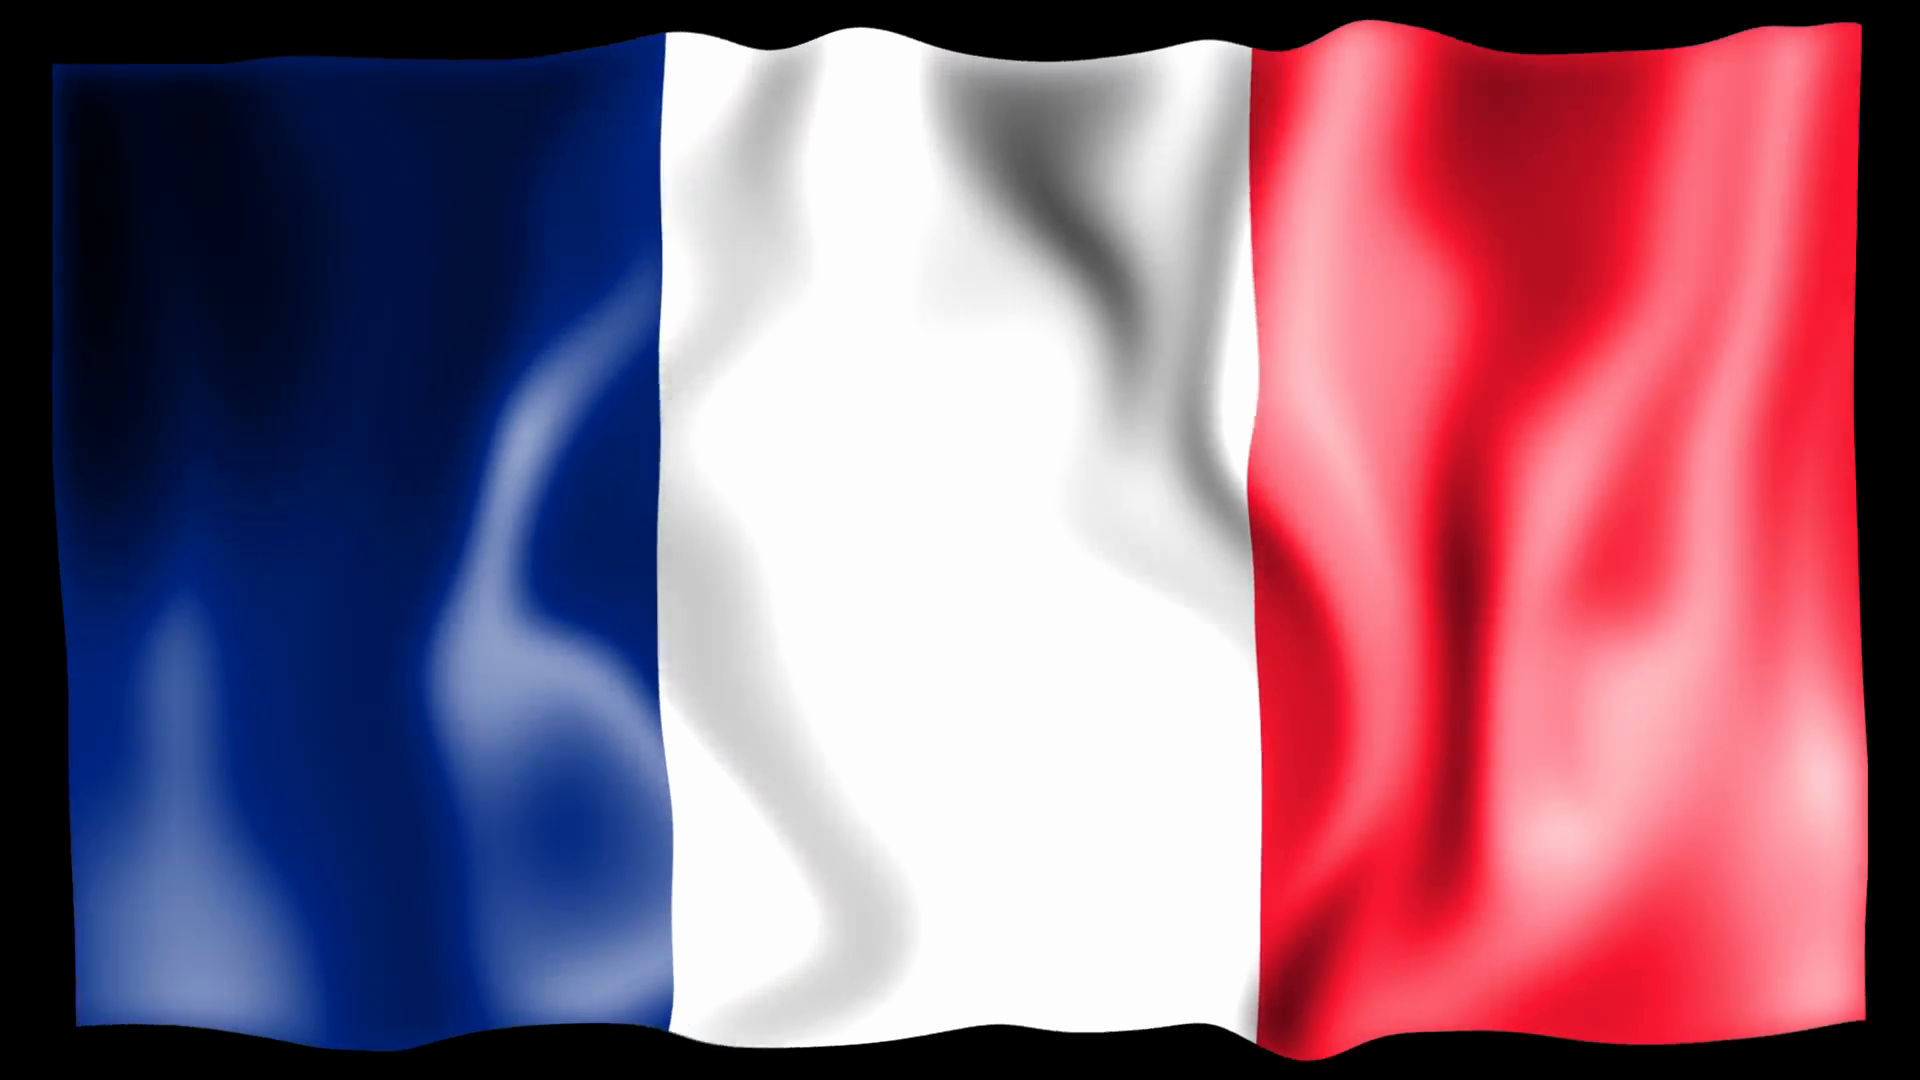 Waving Flag after Effects Elegant Waving France Flag Animation Motion Background